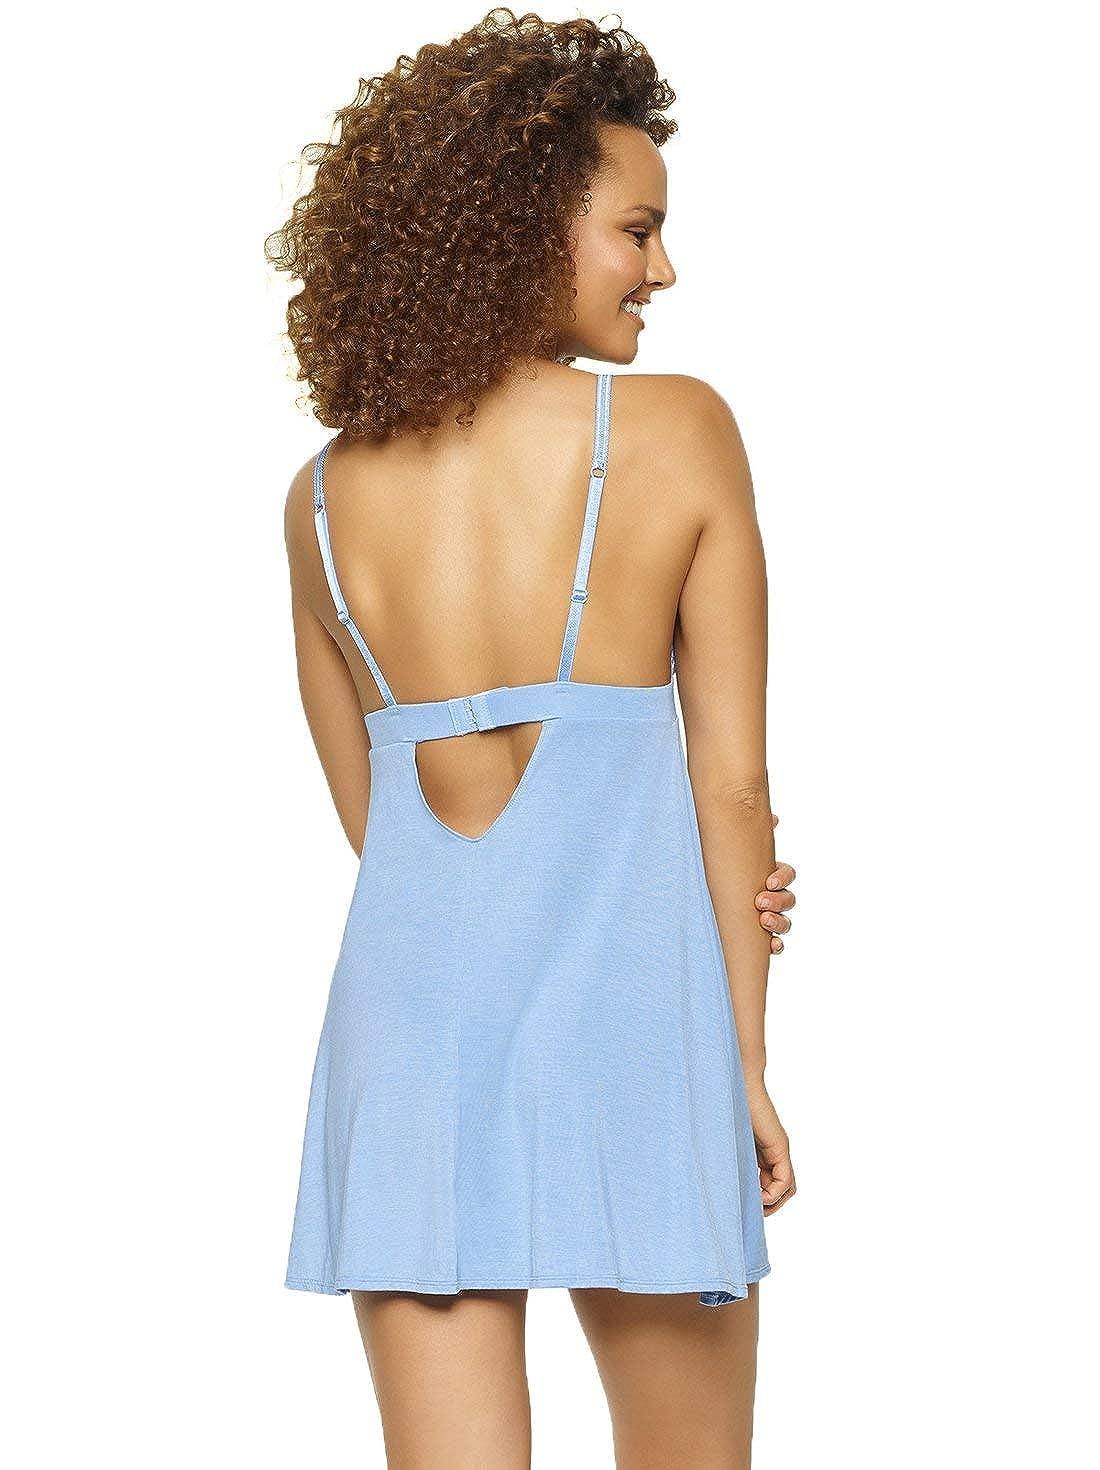 12d573fb7104 Jezebel Women's Demure Chemise at Amazon Women's Clothing store: